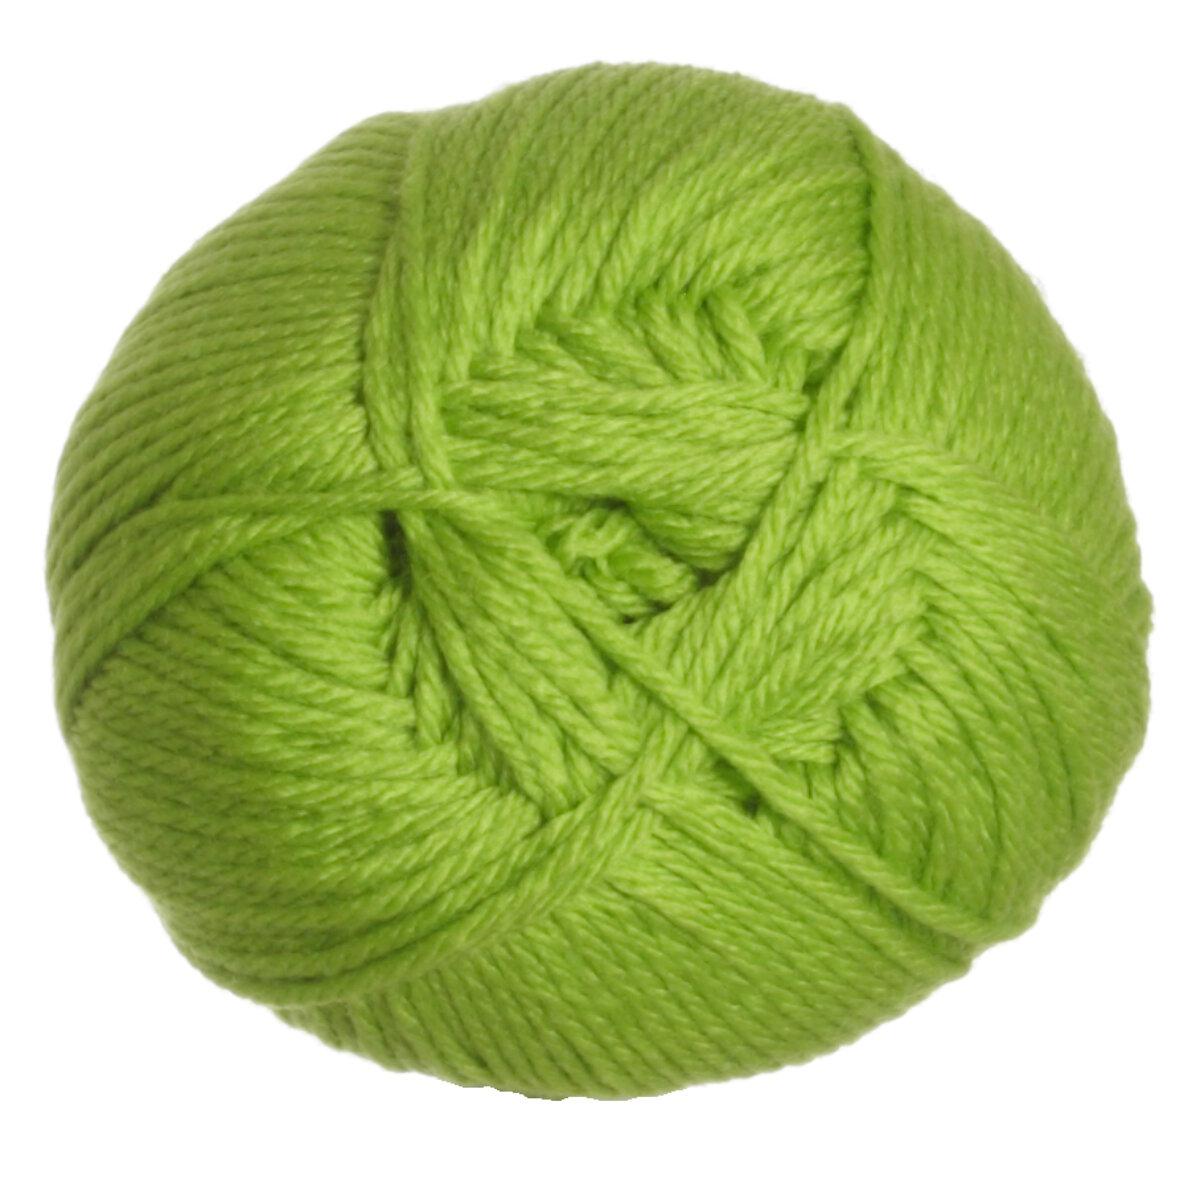 Cascade Pacific Yarn - 095 Lime Green